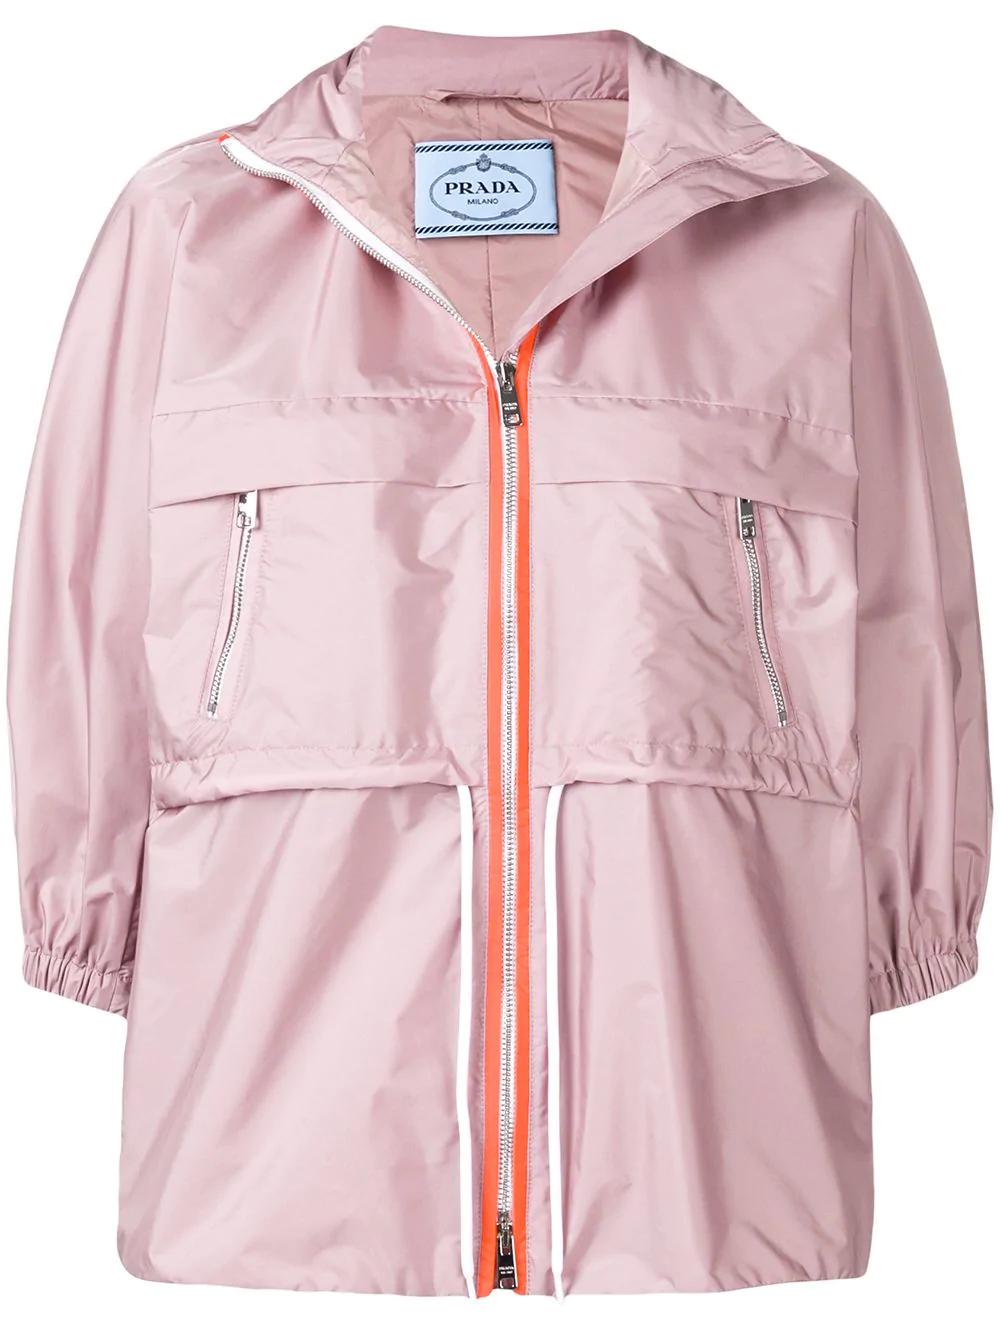 acec8a4973b9aa Prada Nylon Windbreaker Jacket In F0296 Rose | ModeSens